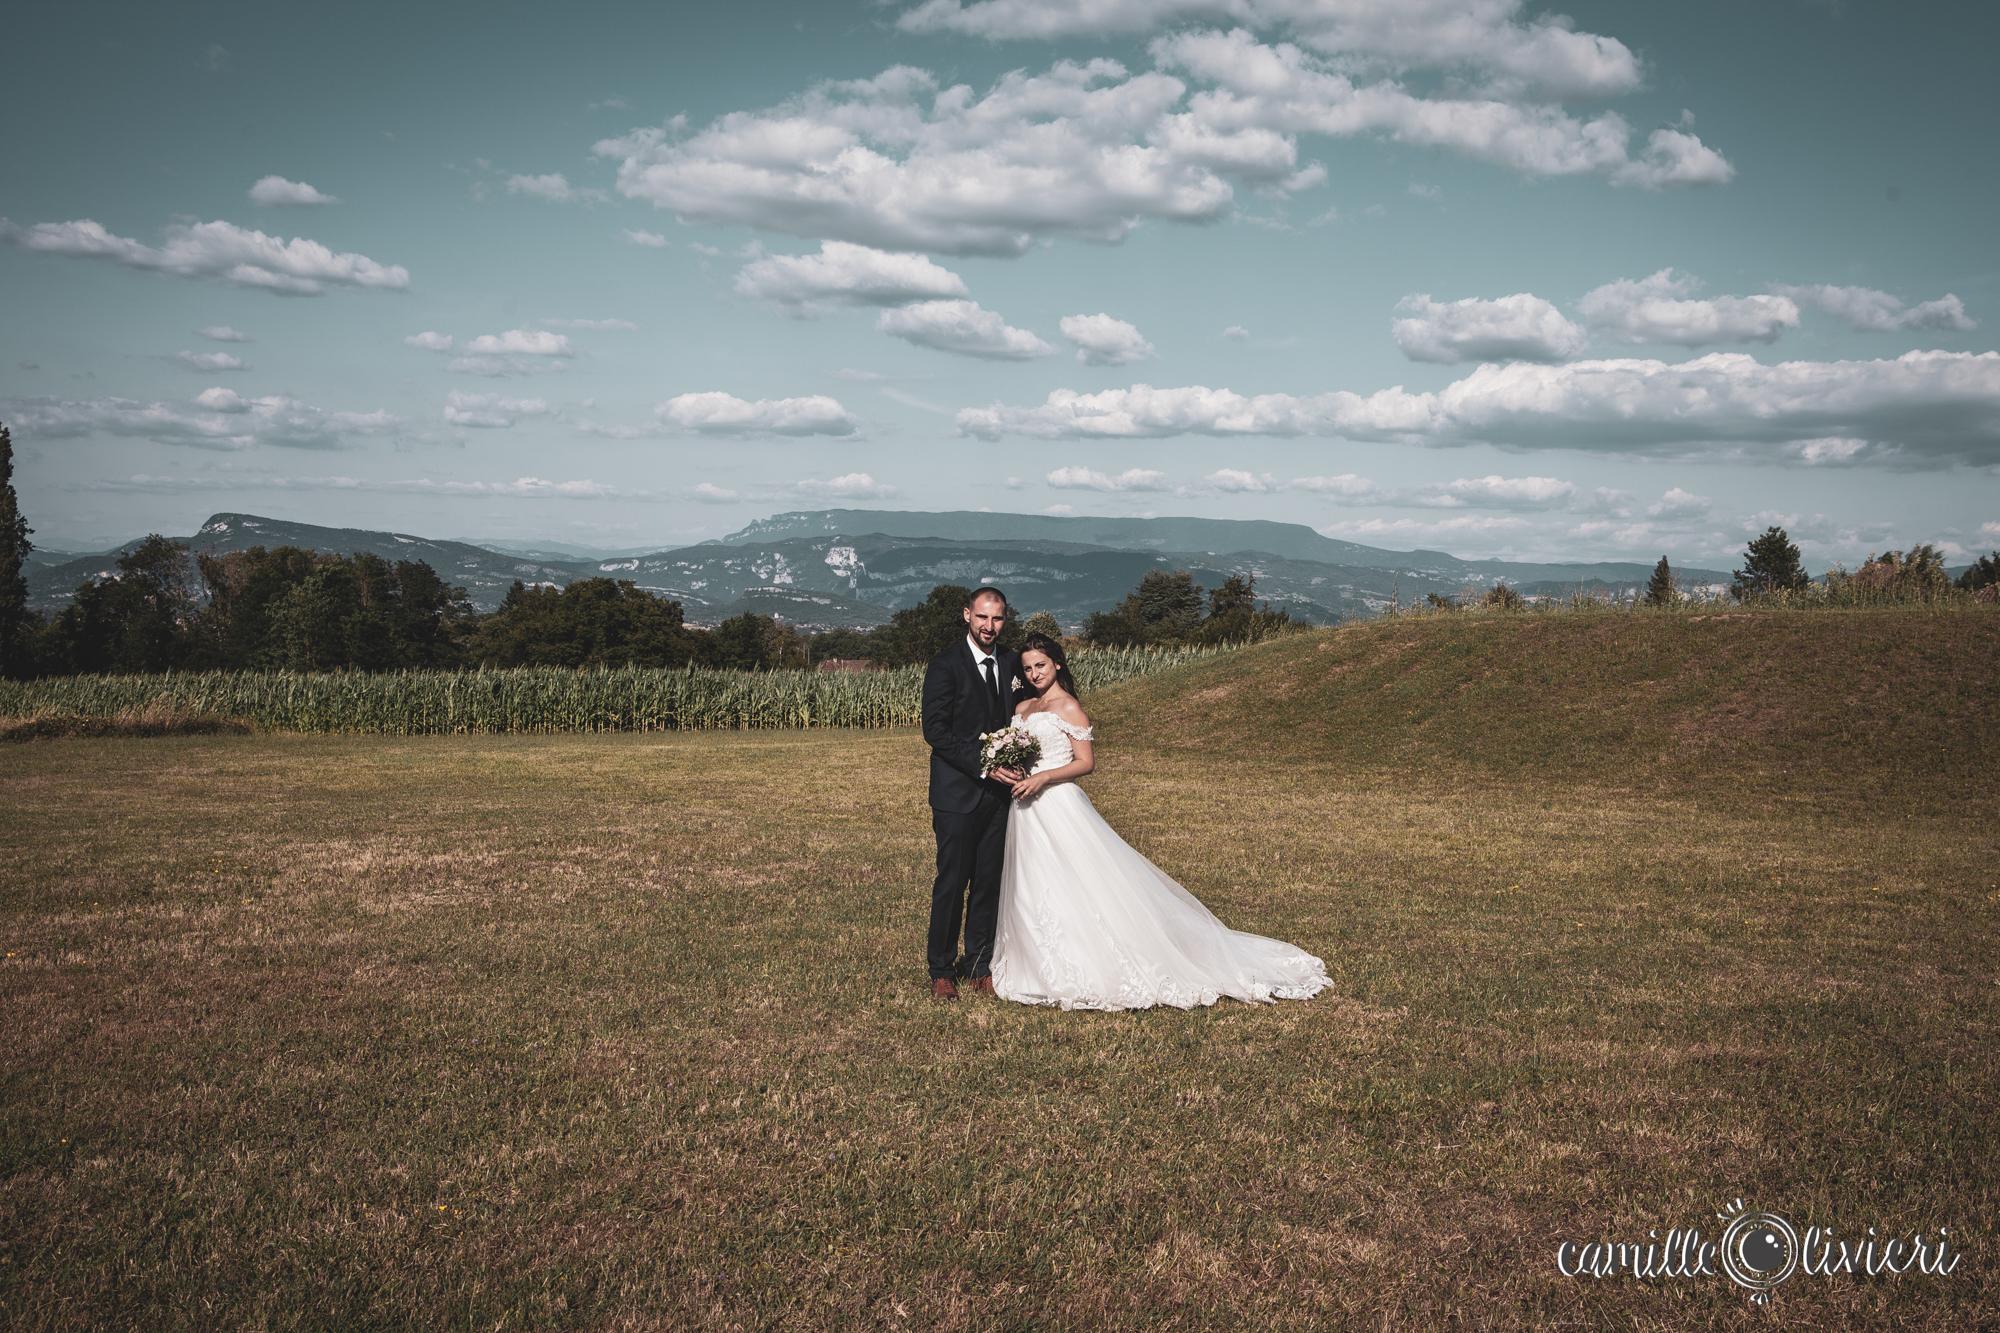 photographe_grenoble_mariage-camille-olivieri-63